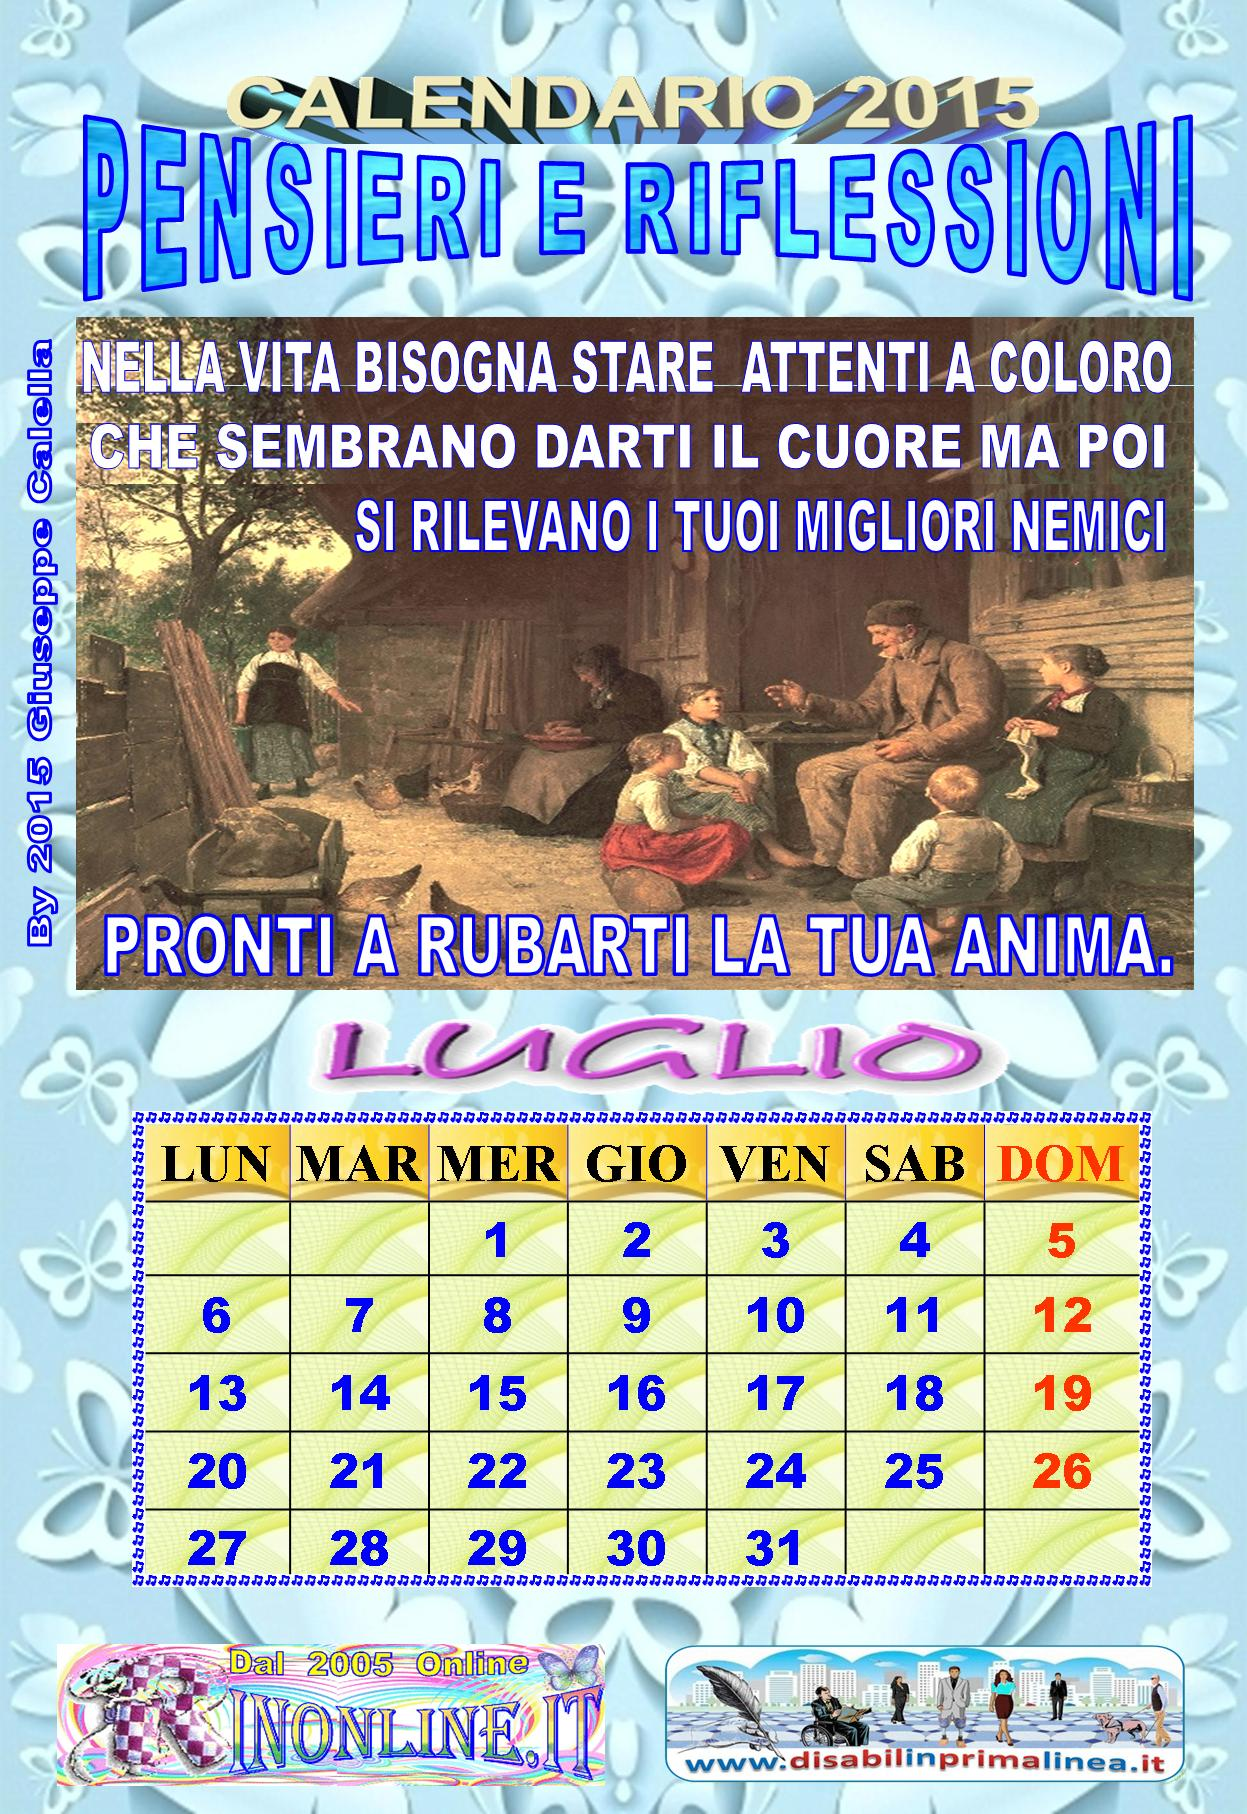 luglio_calendario_2015_pensieri_riflessioni_giuseppe_calella